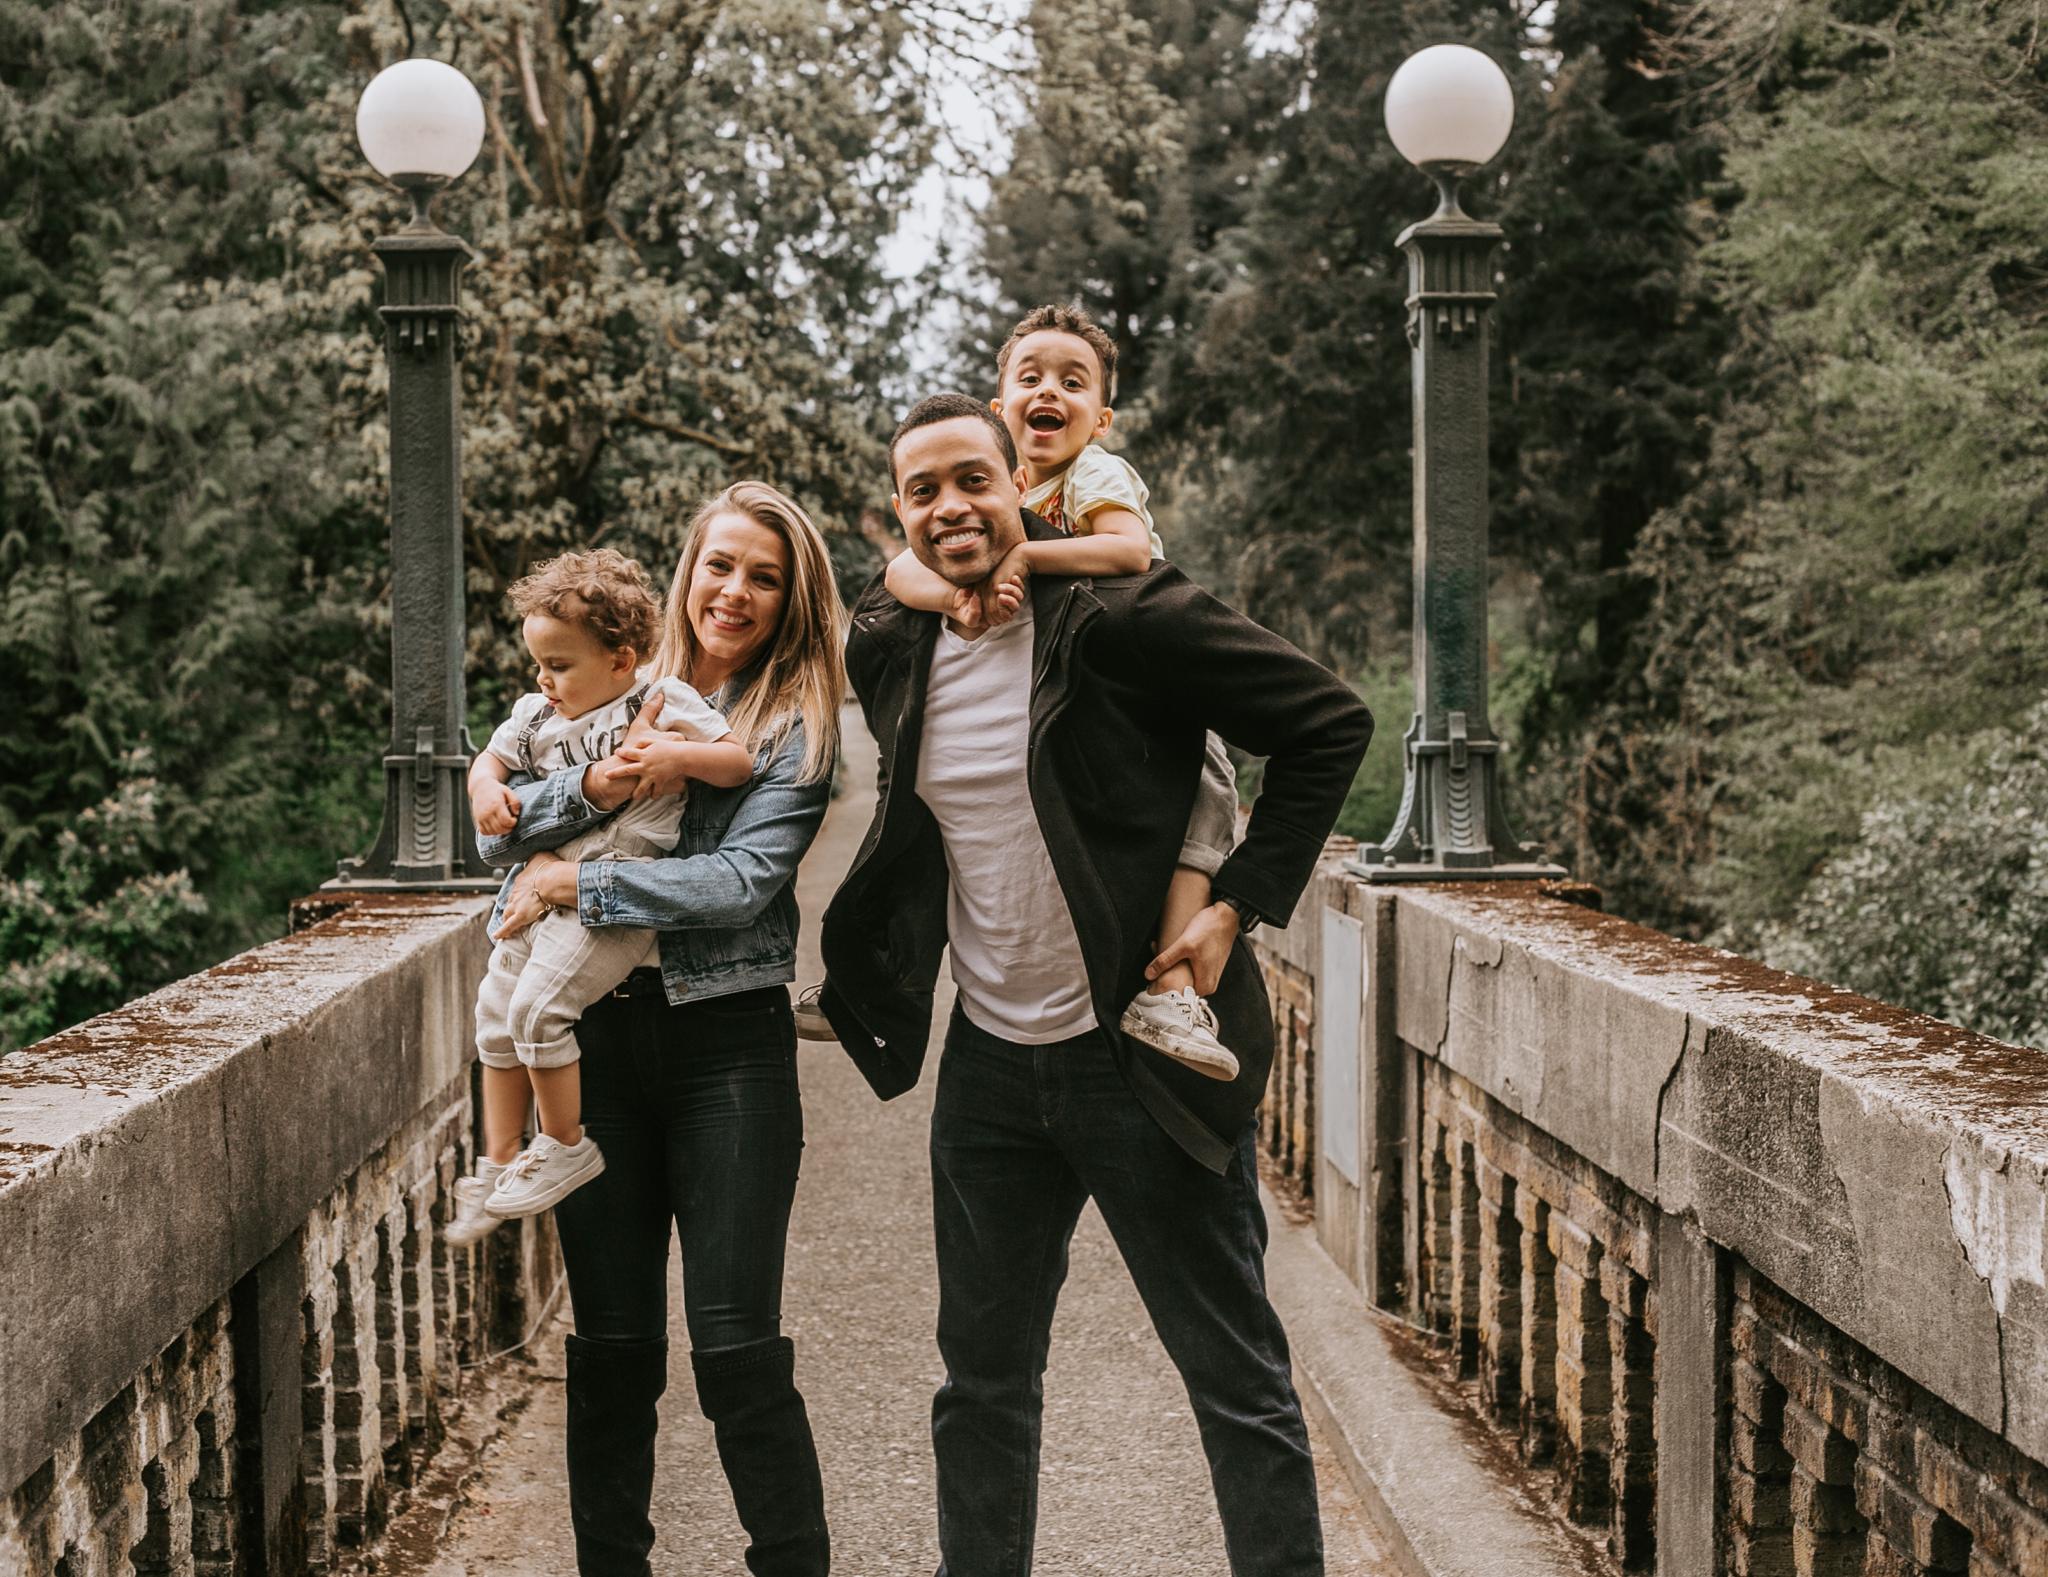 Seattle_arboretum_family_photography_41 (1 of 1)